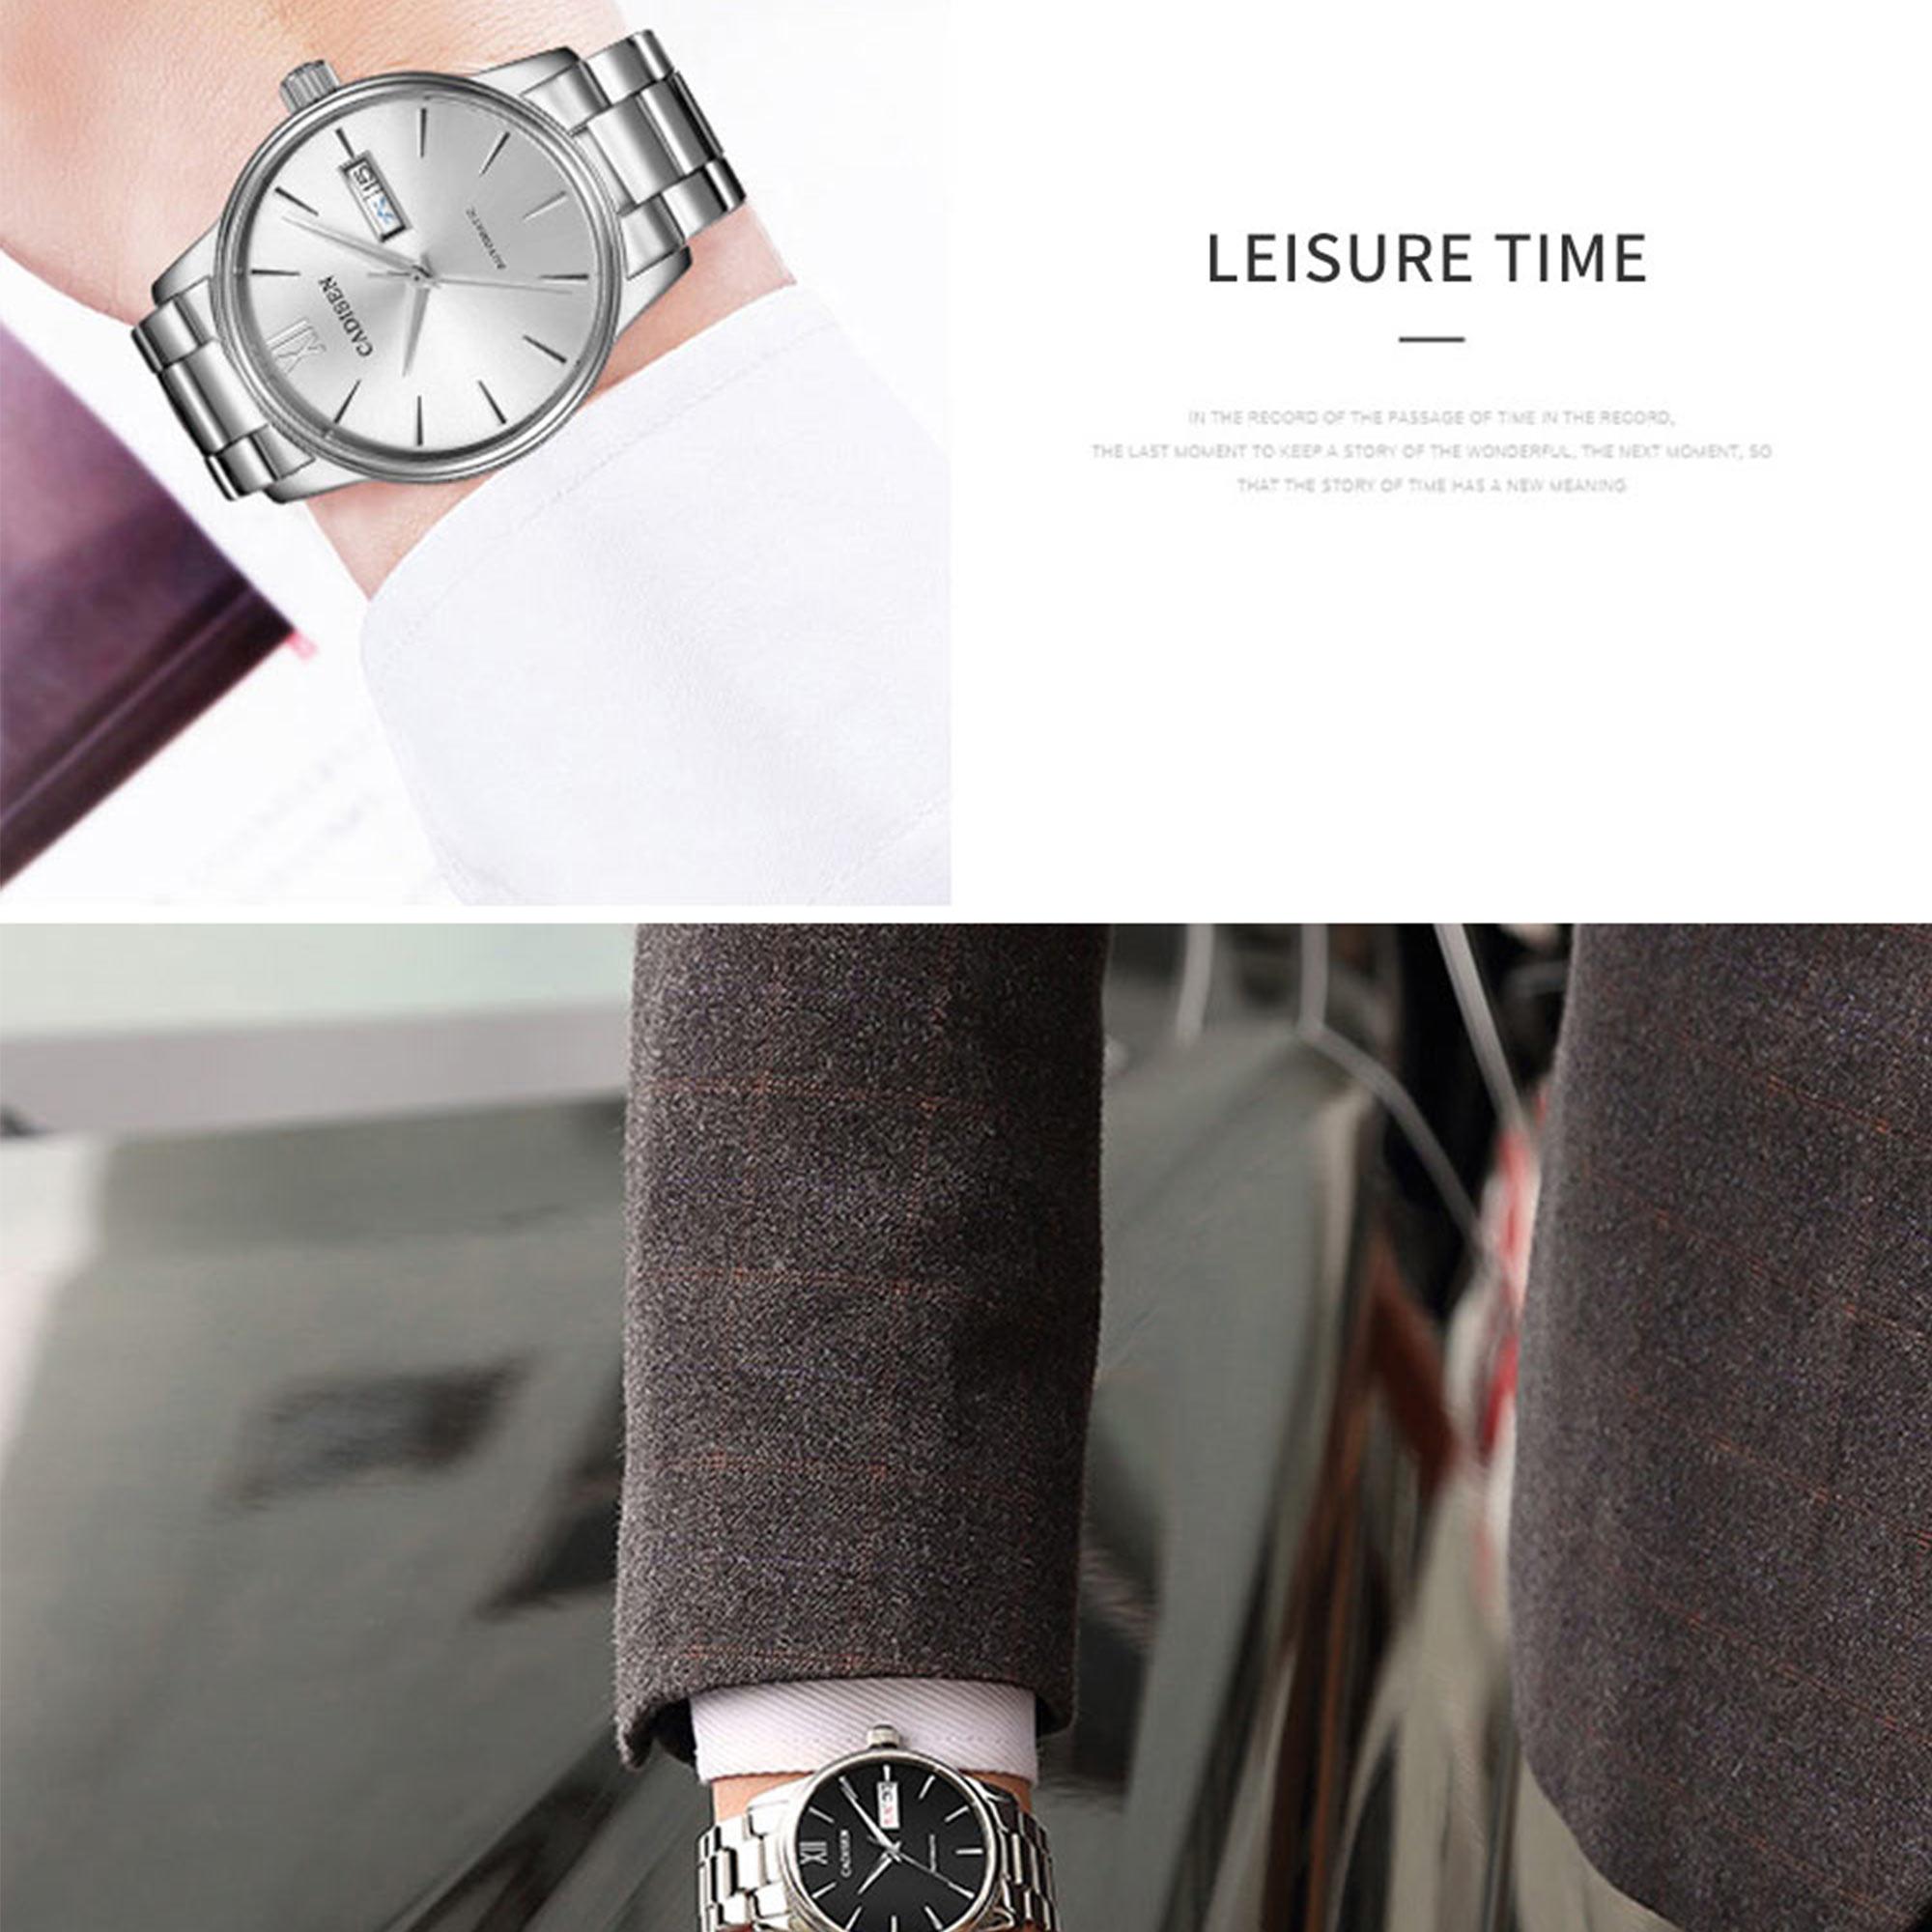 He1d505efd3b3456cbfef6e4f07f126b6X CADISEN Men Watch Automatic Mechanical Watches Role Date Week Top Luxury Brand Japan NH36A Wrist watch Clock Relogio Masculino